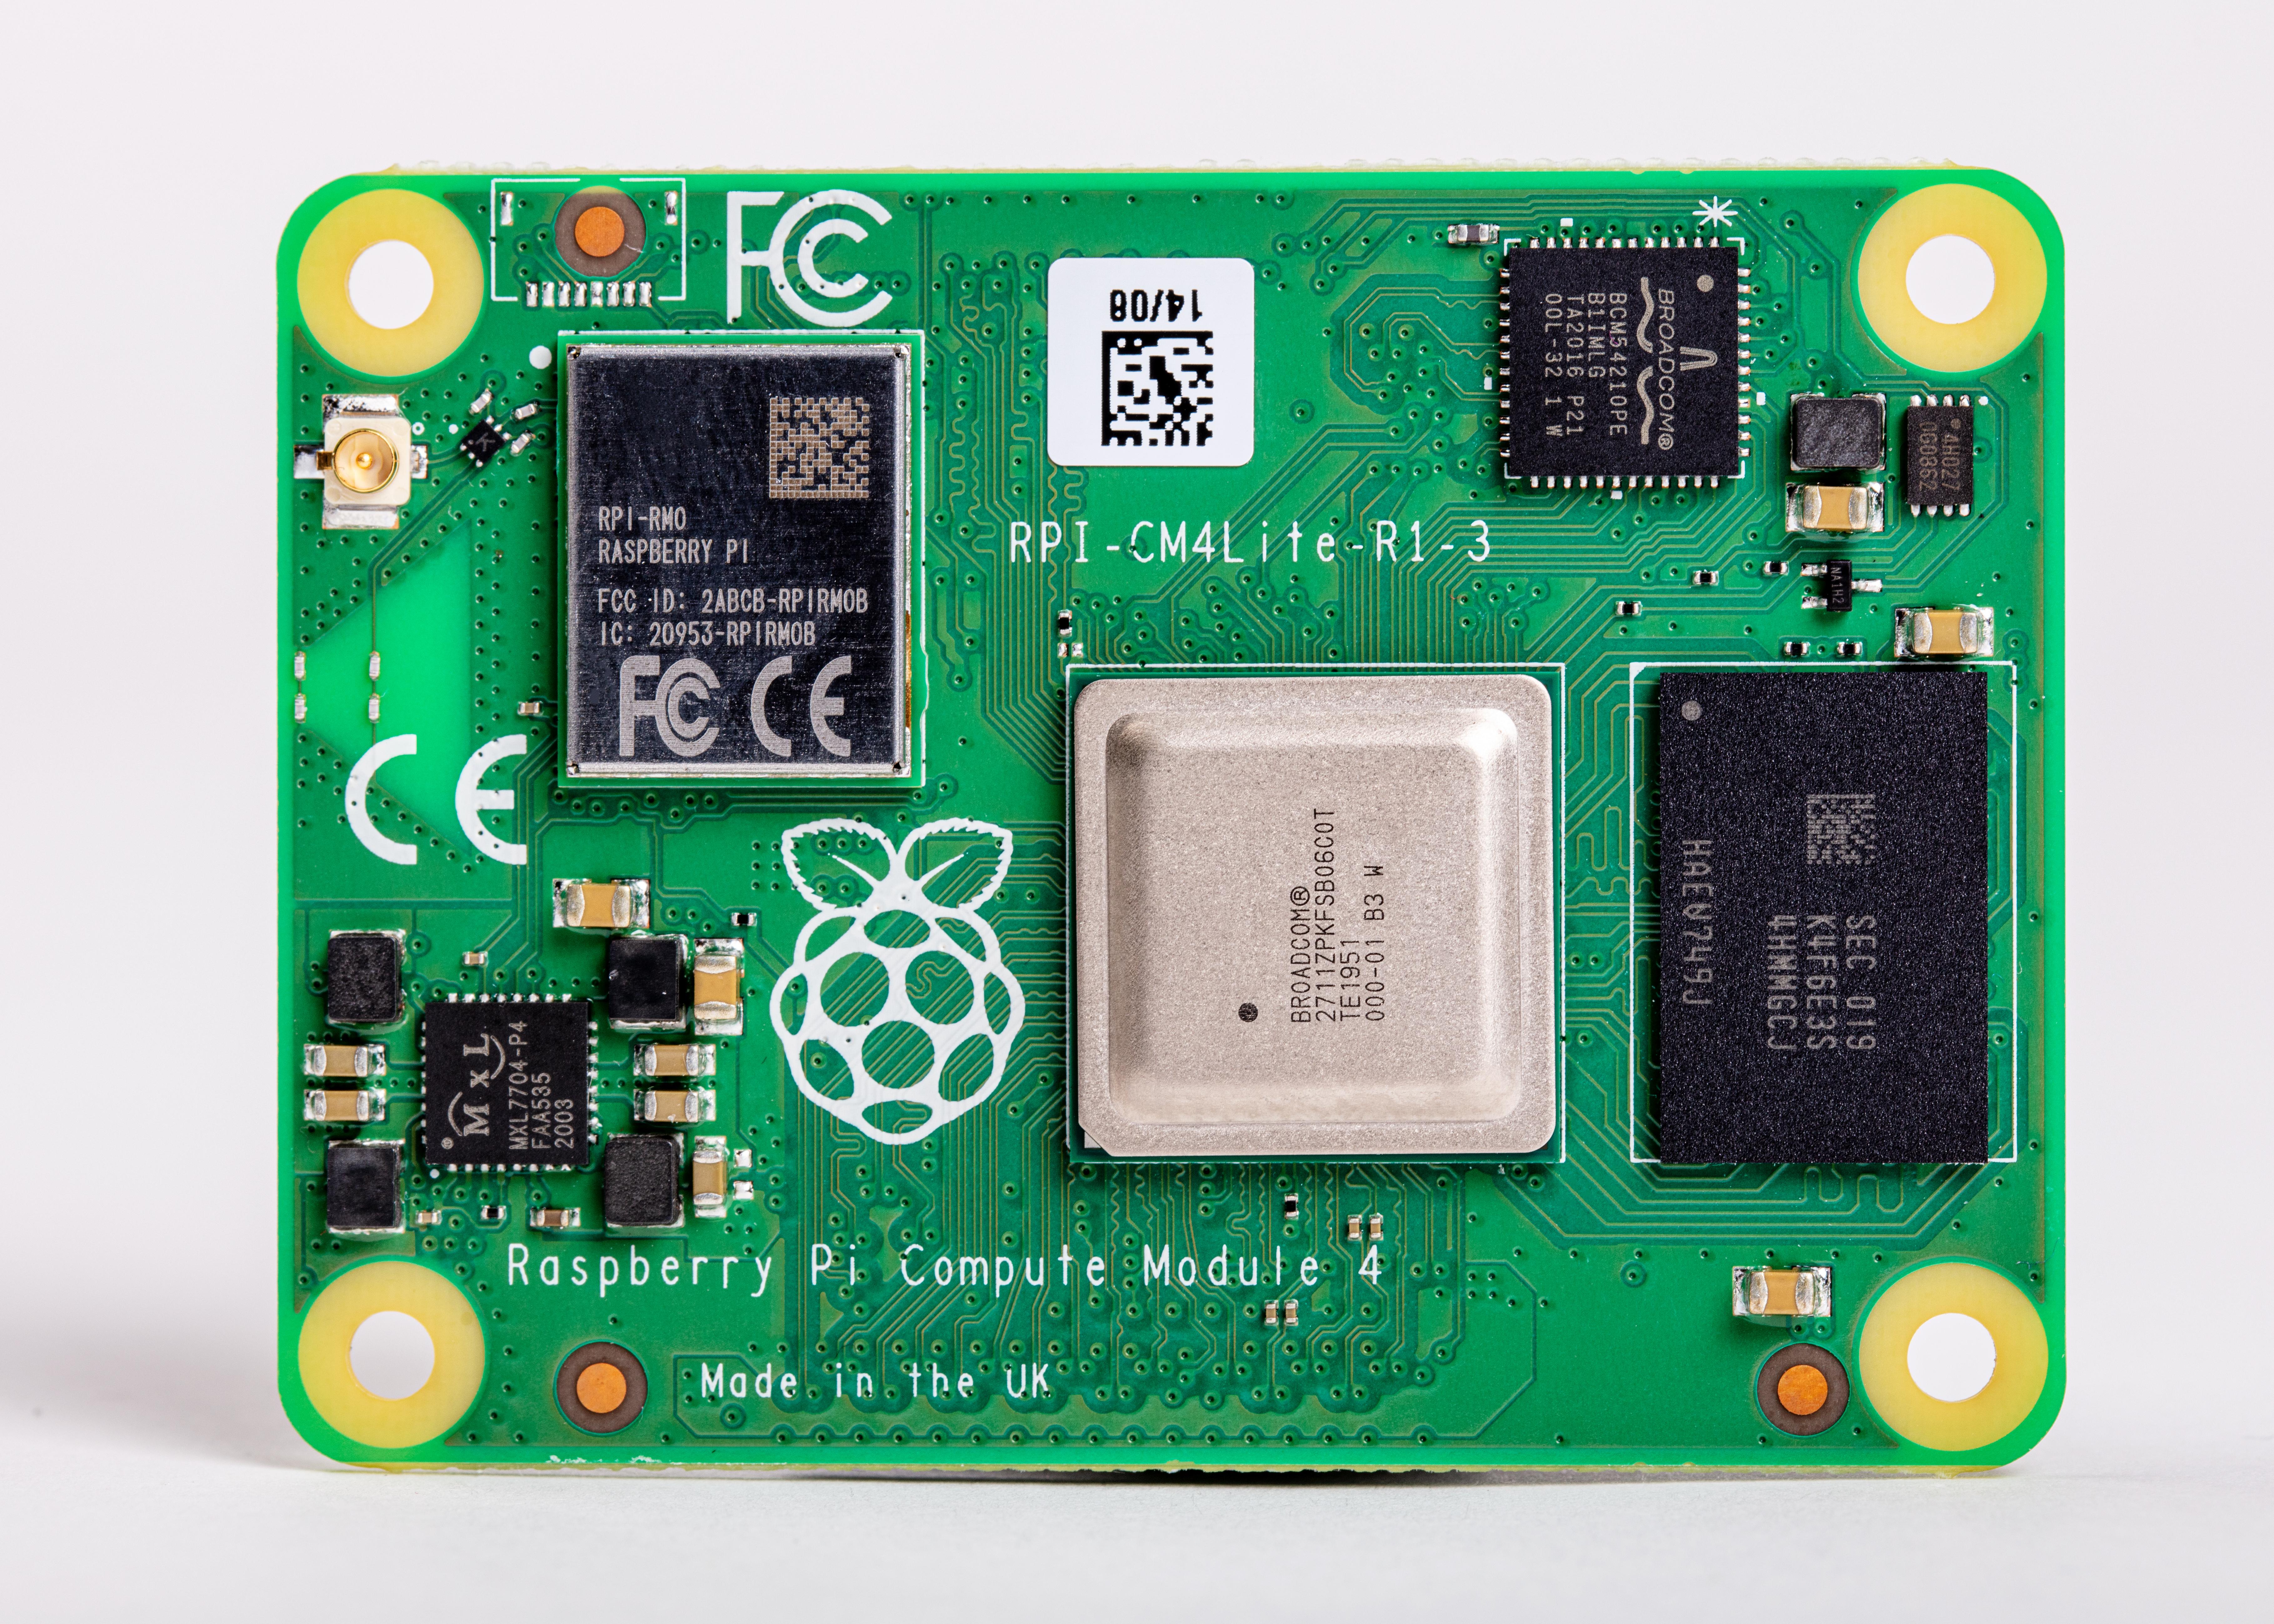 Raspberry Pi Compute Module 4 with WiFi 4GB RAM Lite